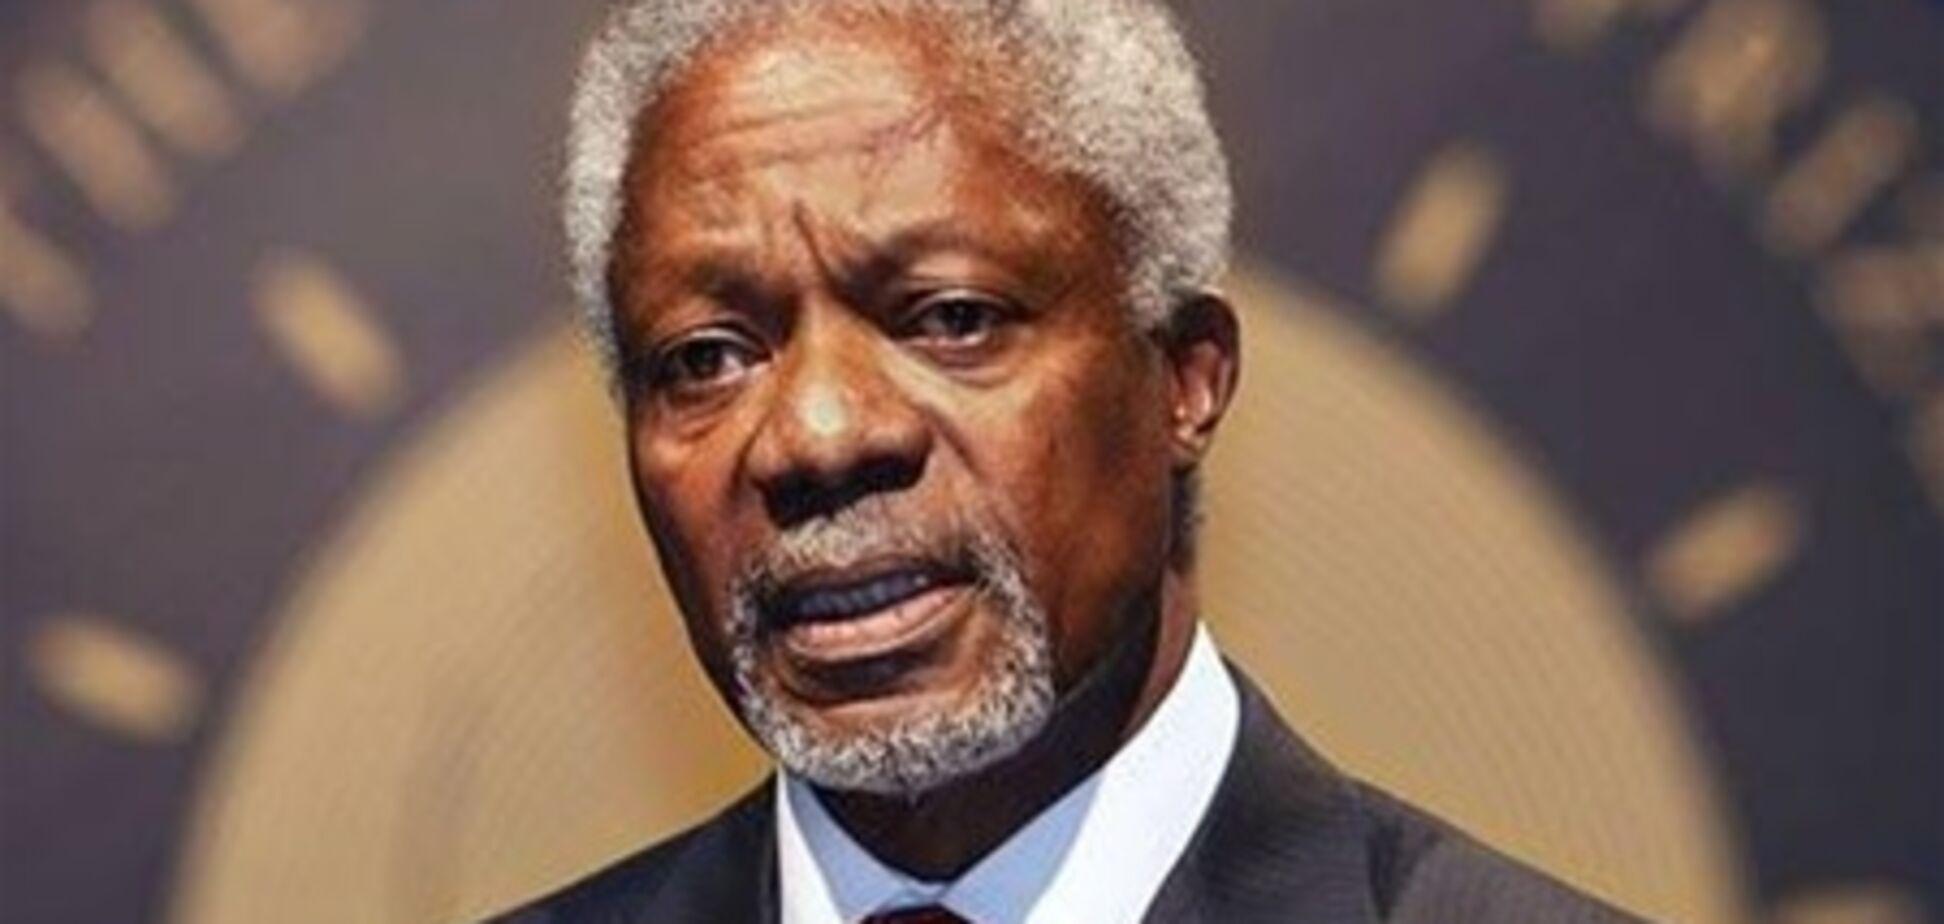 Аннан: кризис в Сирии усугубился